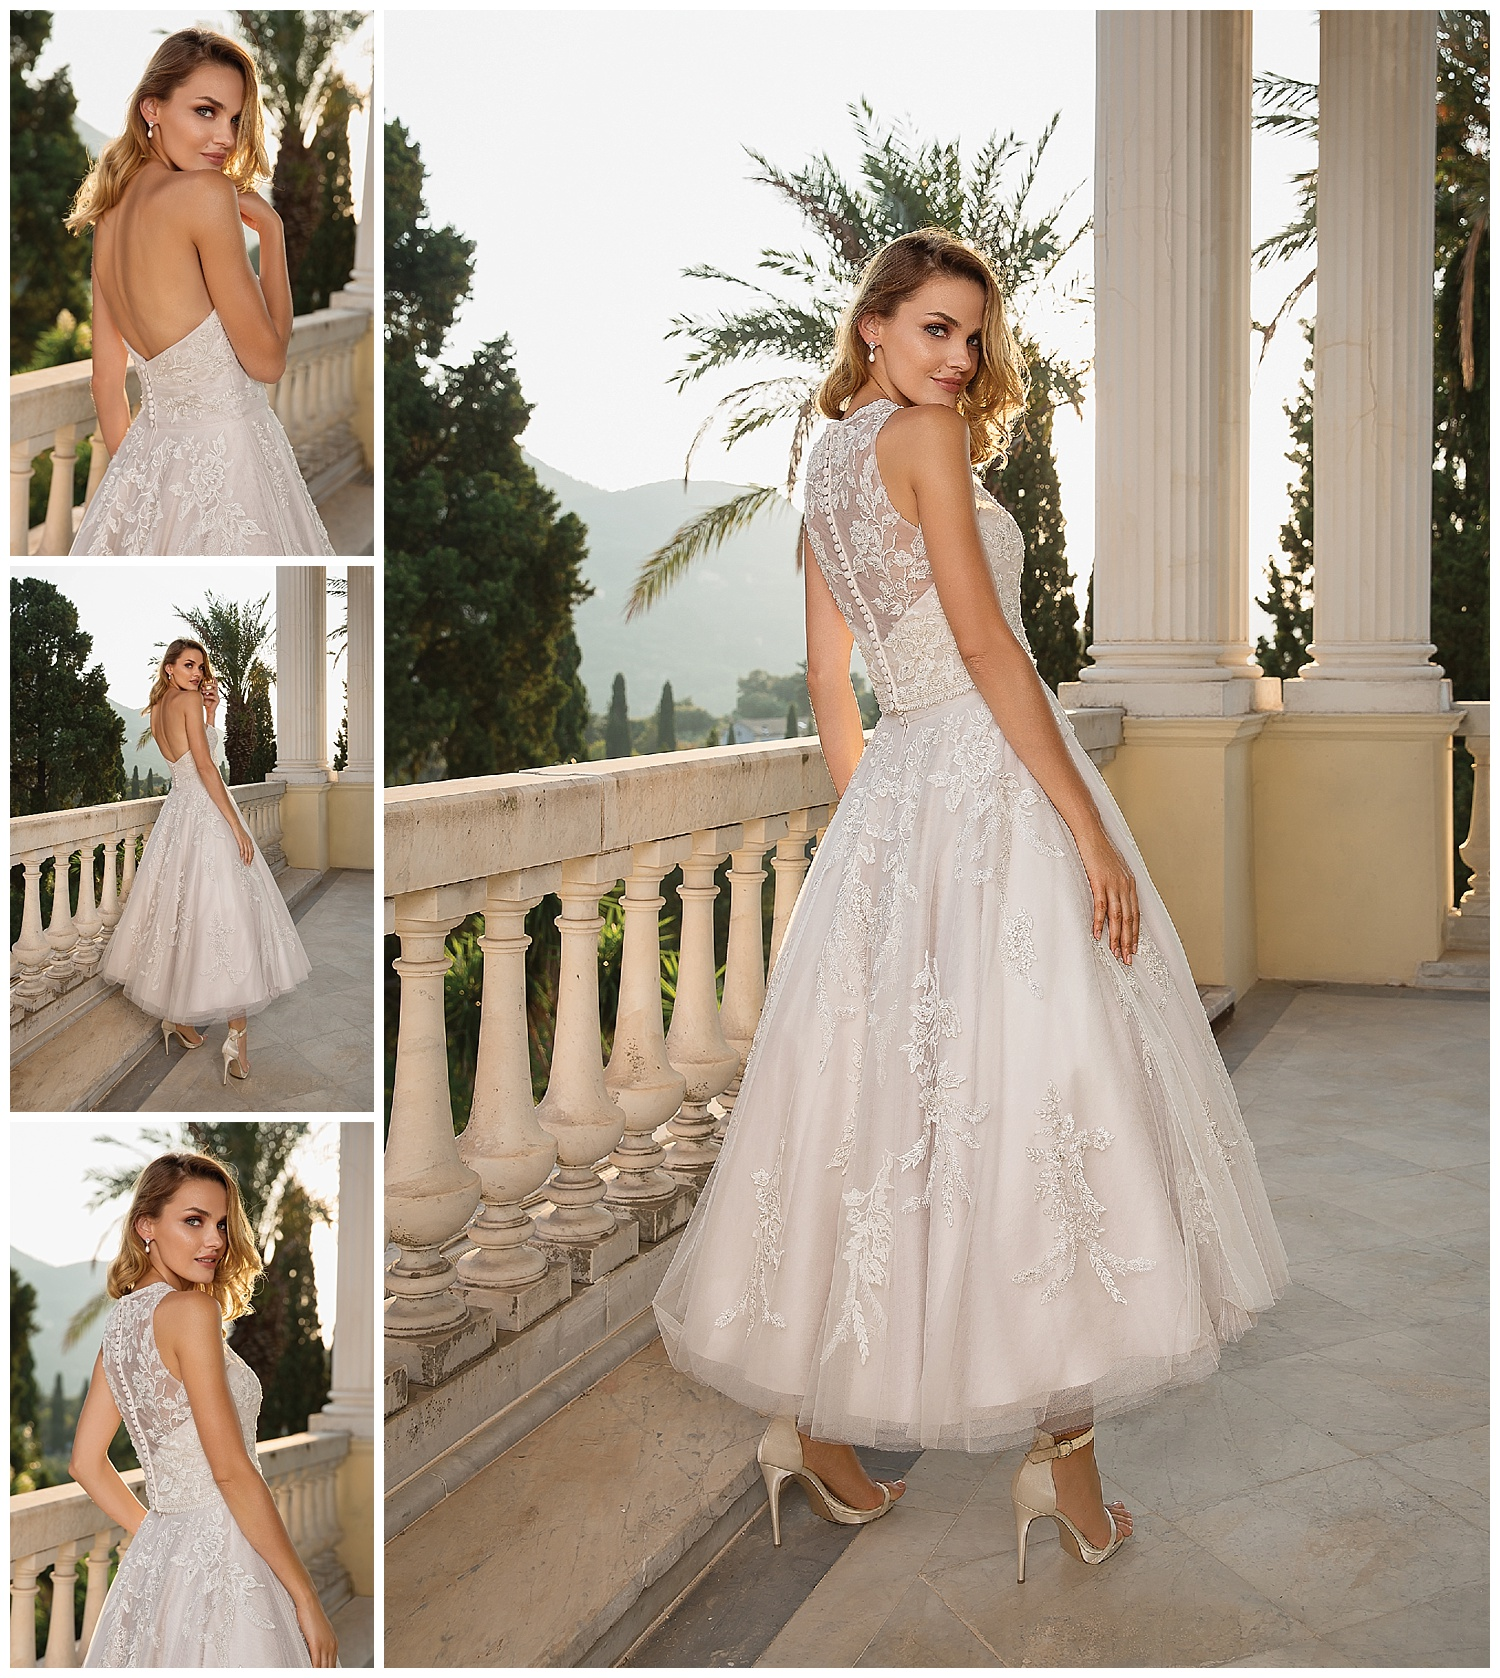 justin-alexander-88089-vintage-style-wedding-dress-epiphany-boutique-carmel-california.jpg